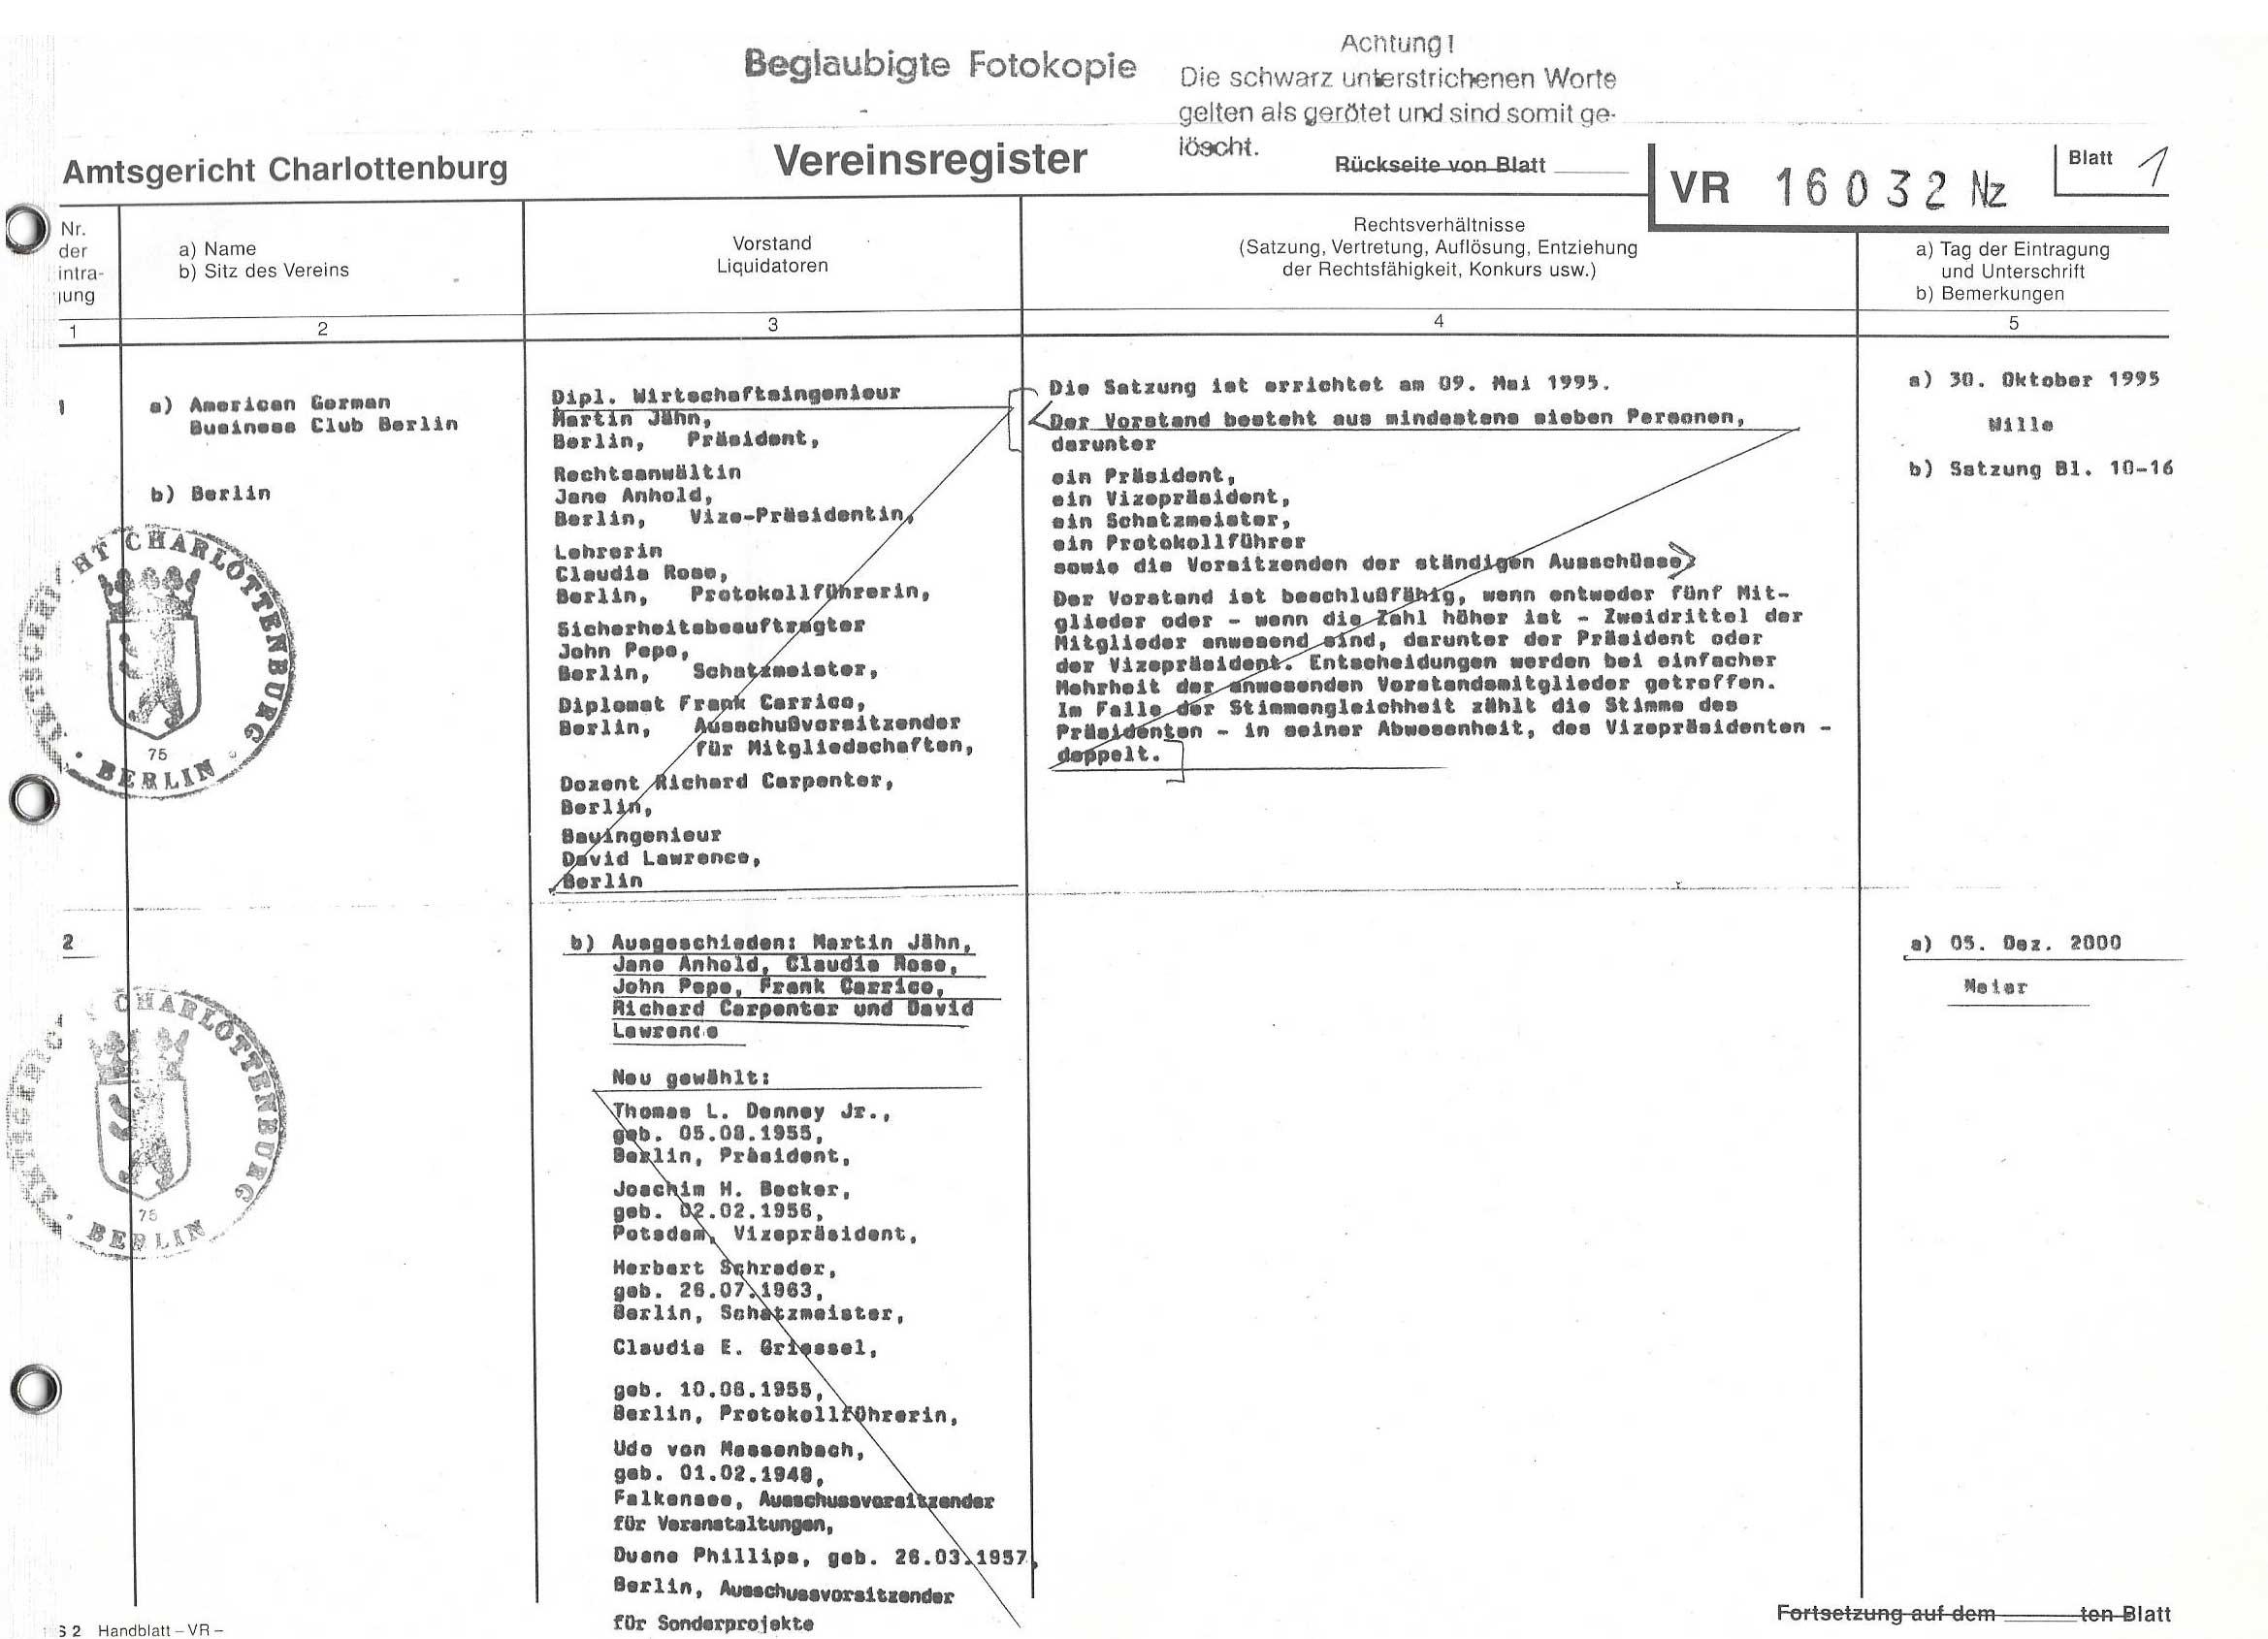 Amtsgericht-Charlottenburg-Vereinsregister-05.12.2000